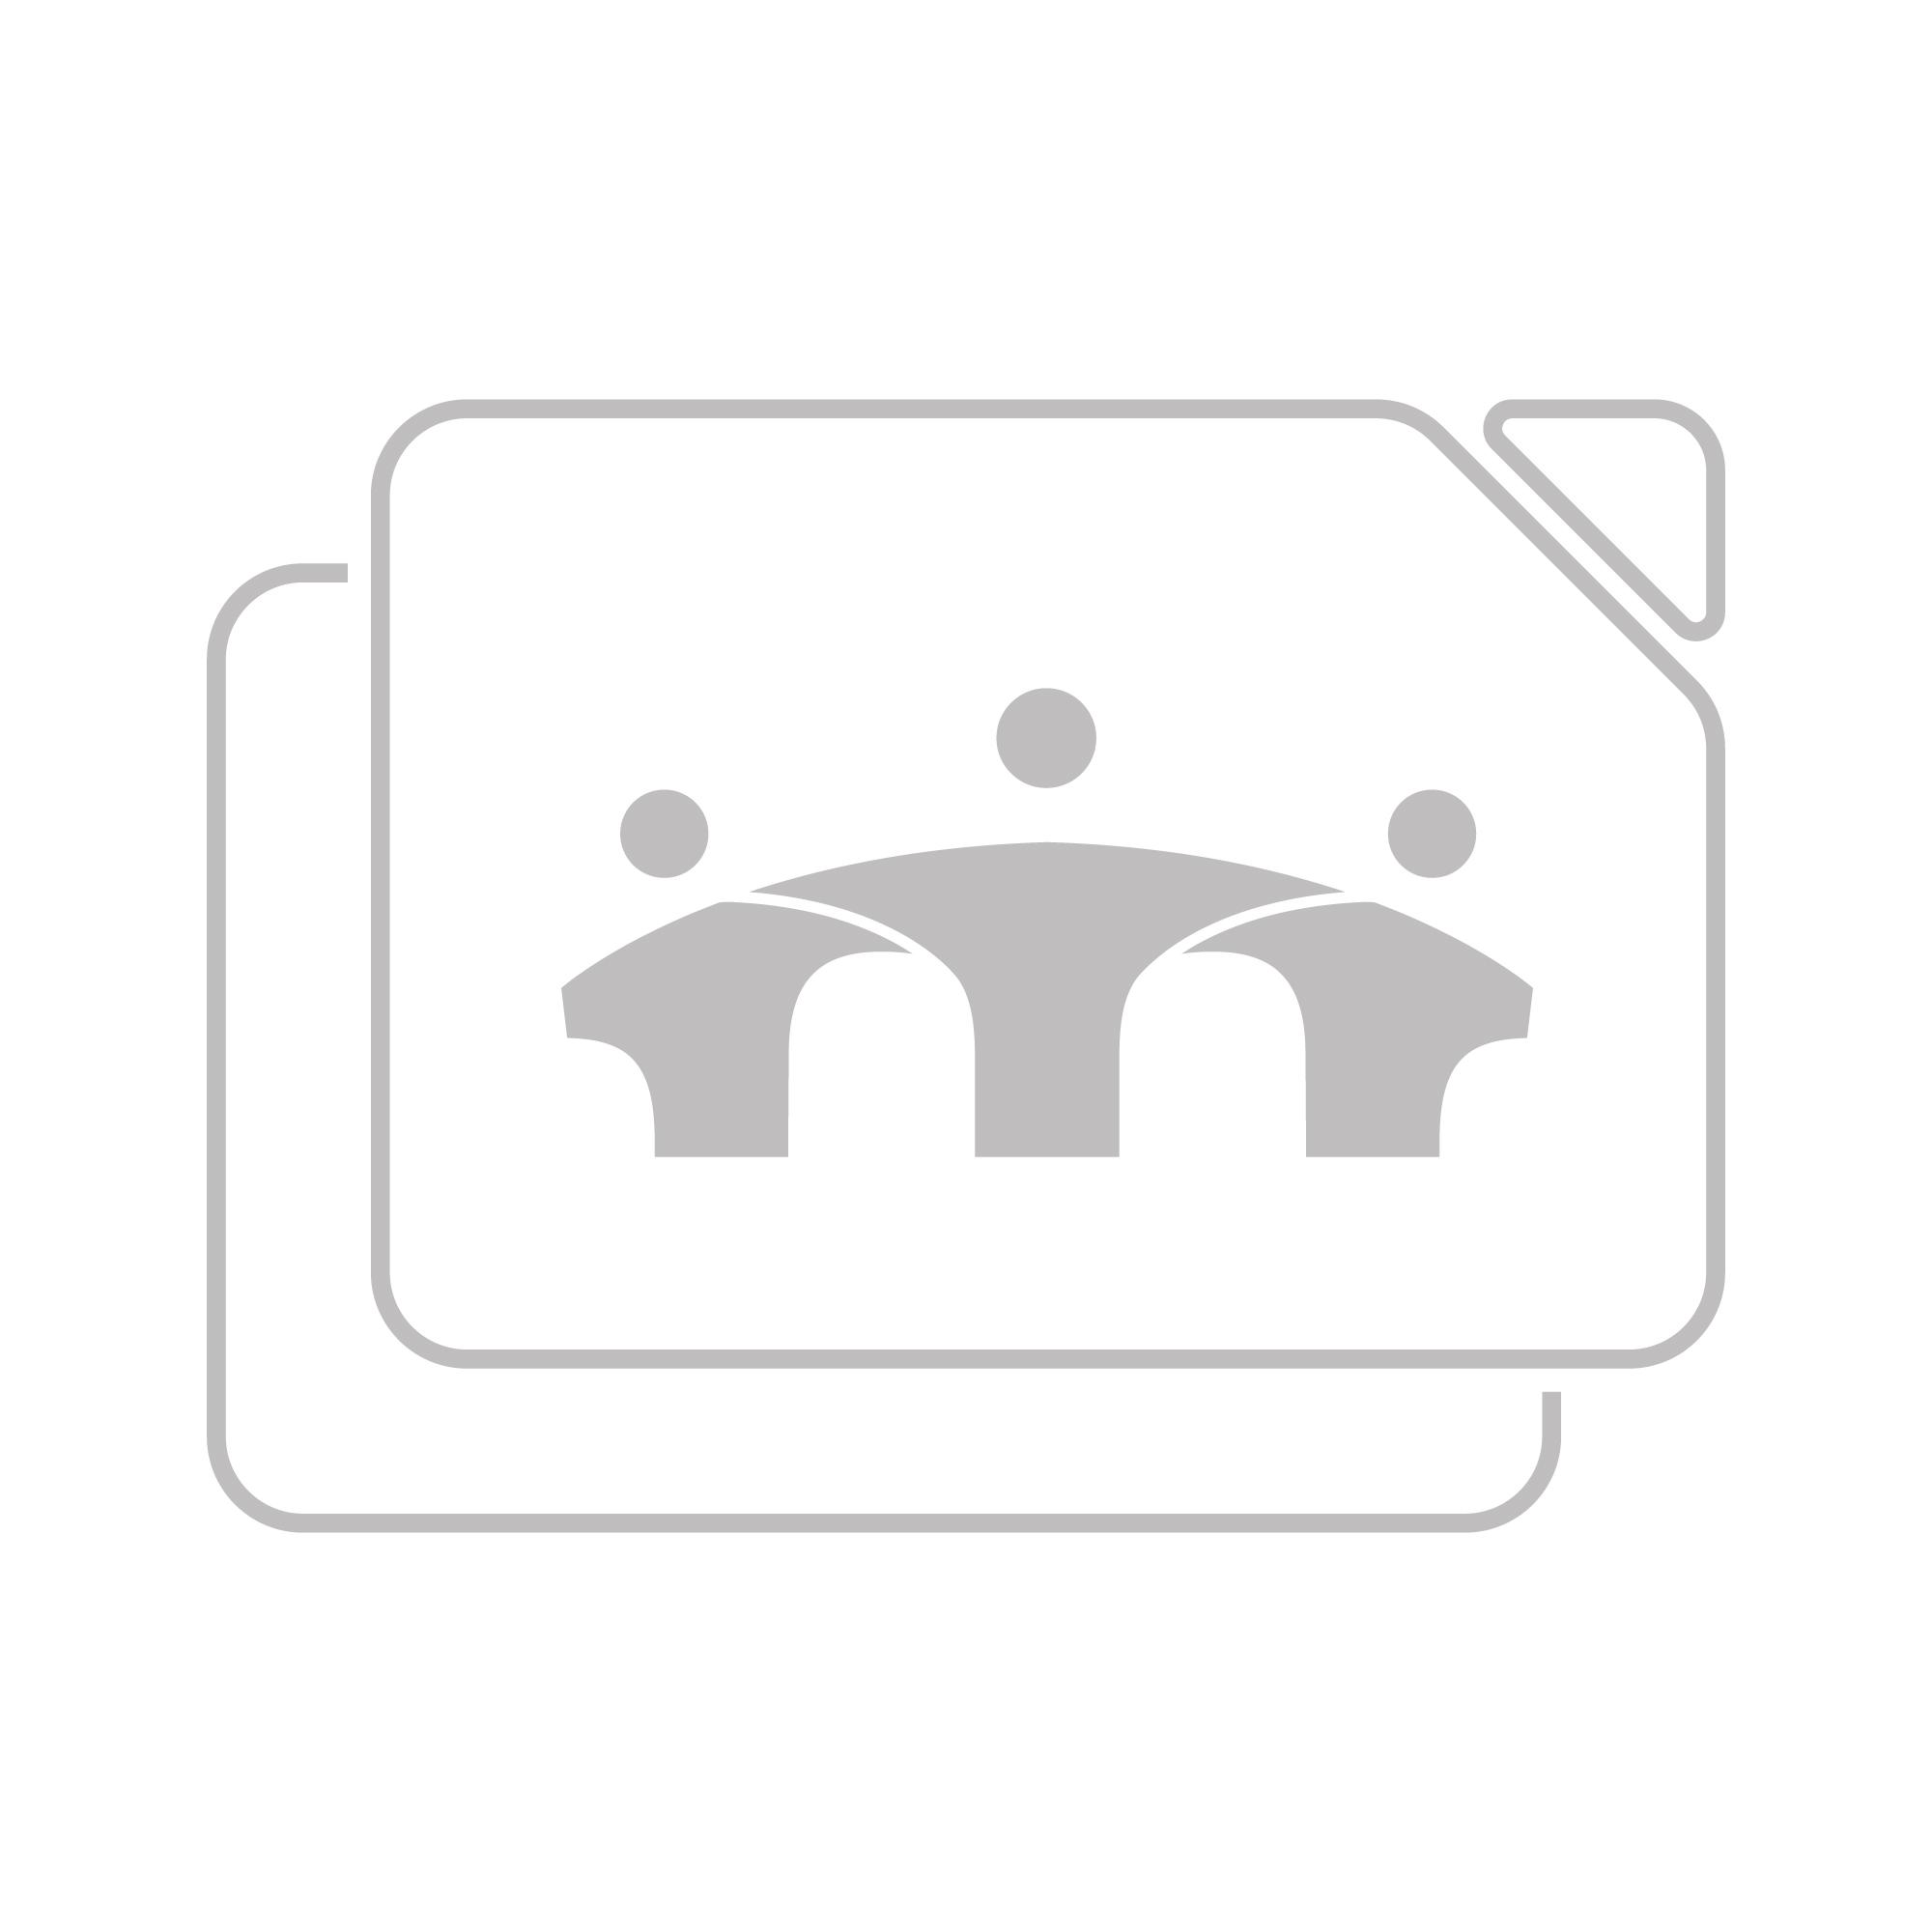 Corsair MM350 Champion Series Premium Gaming Mouse Pad Medium